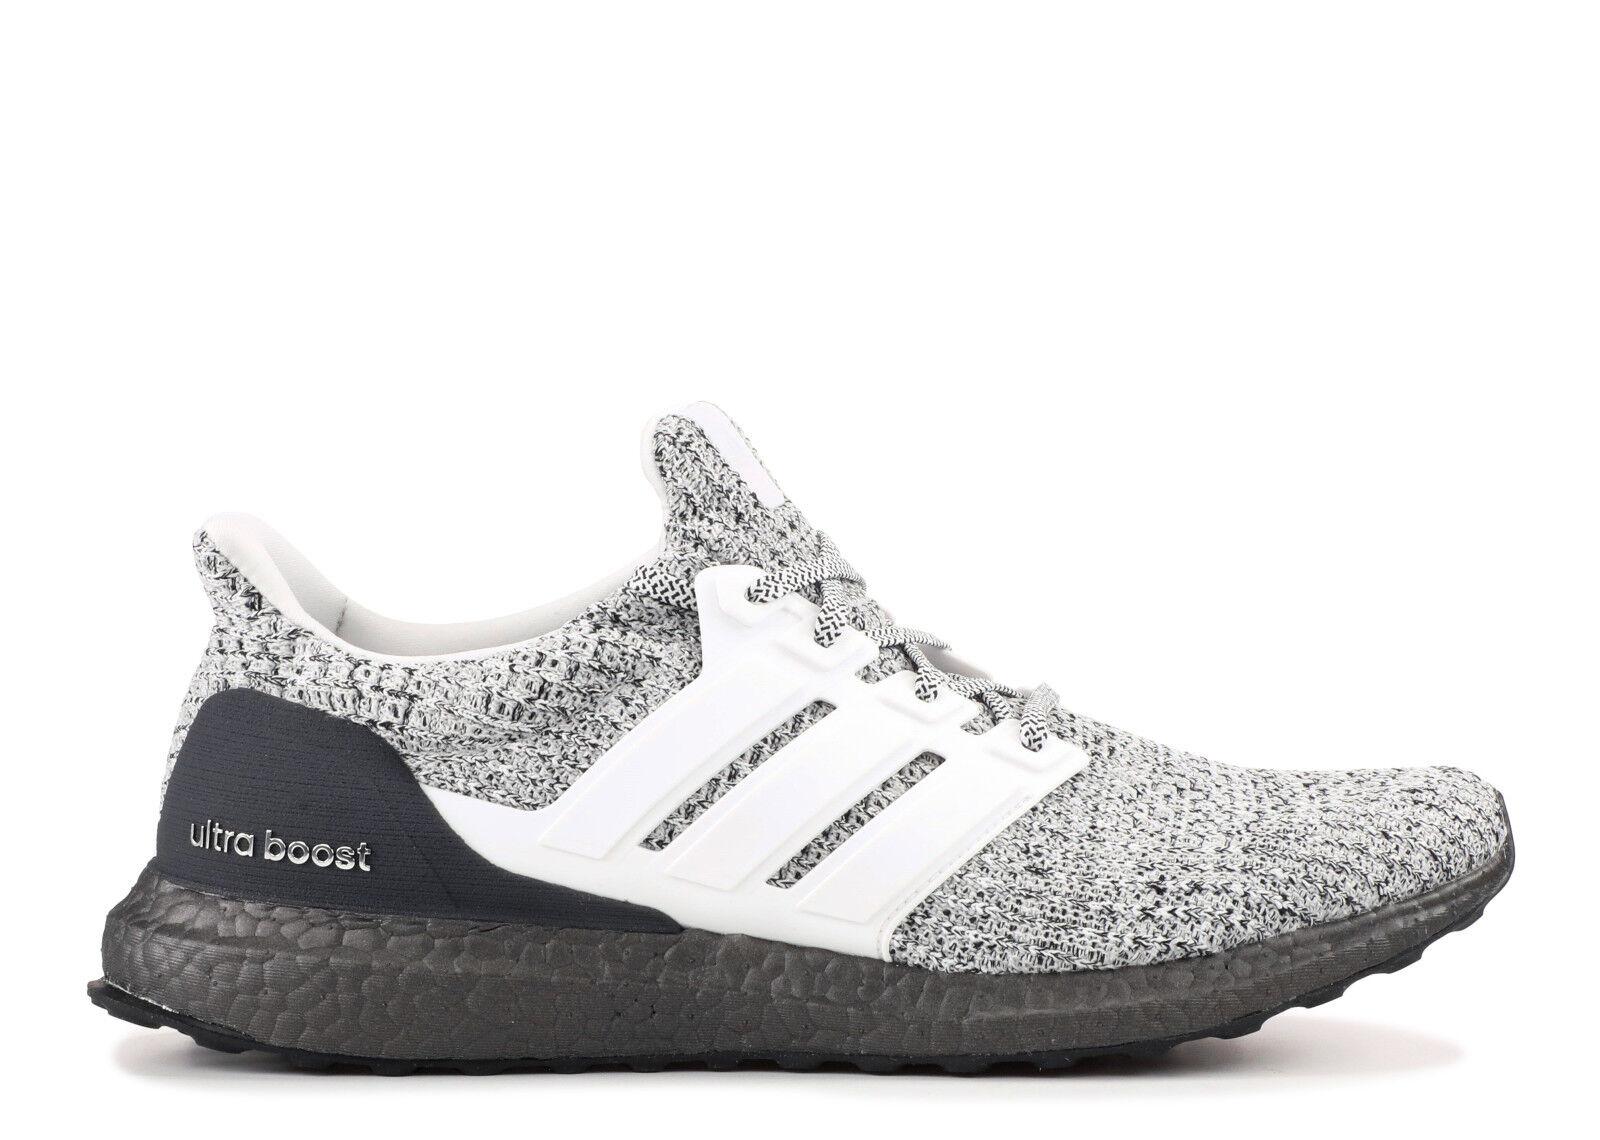 Adidas Ultra White. Boost 4.0 Oreo size 7.5. Black White. Ultra PK Primeknit. BB6180. 15a151